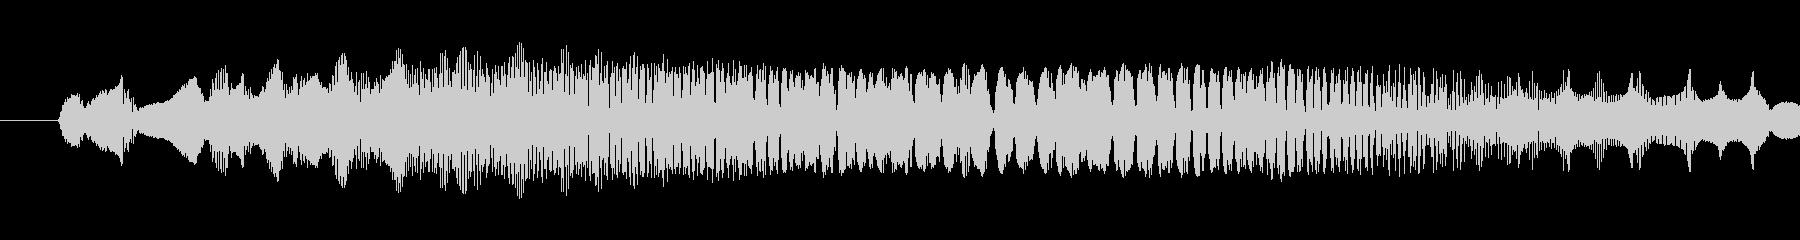 SciFi EC01_89_8の未再生の波形